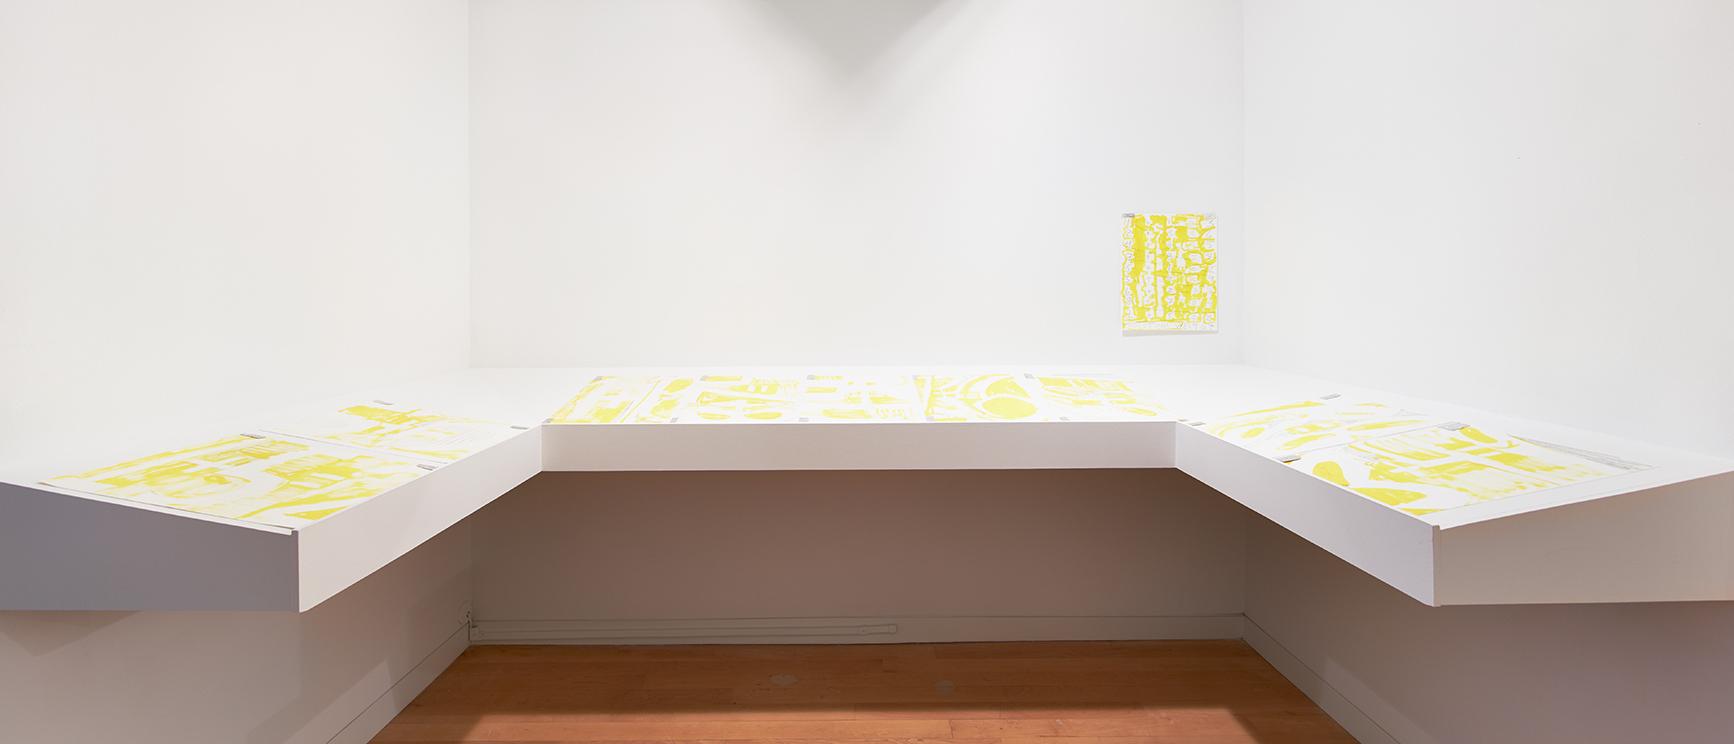 Installation View, Solutions V for Sigmar Polke, 2012